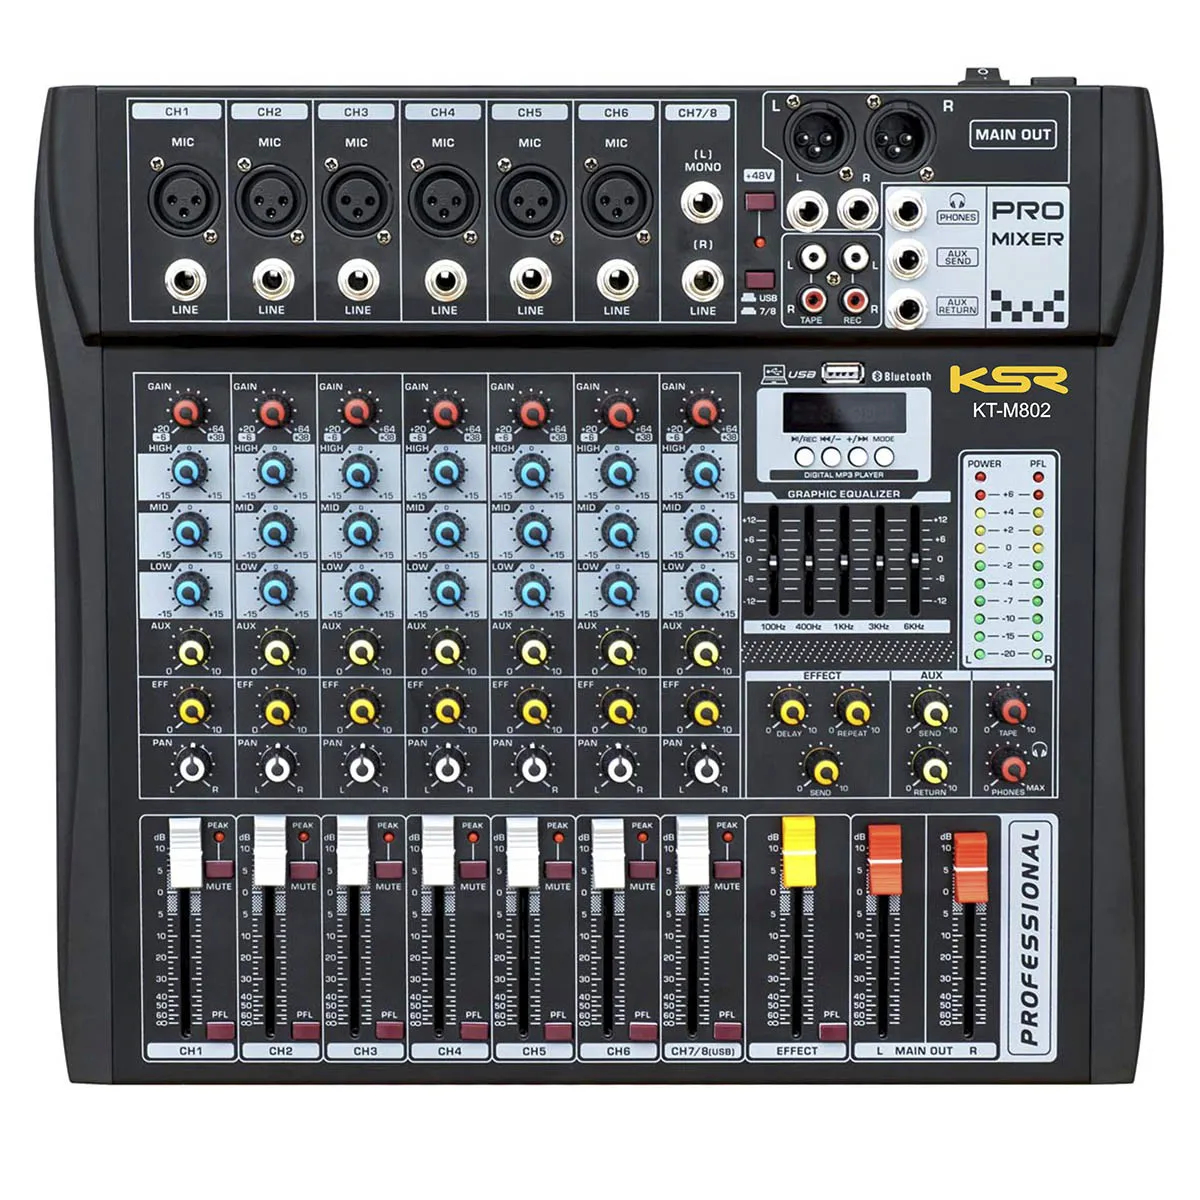 Mesa Analógica KSR Pro KT-M802 8 Canais USB